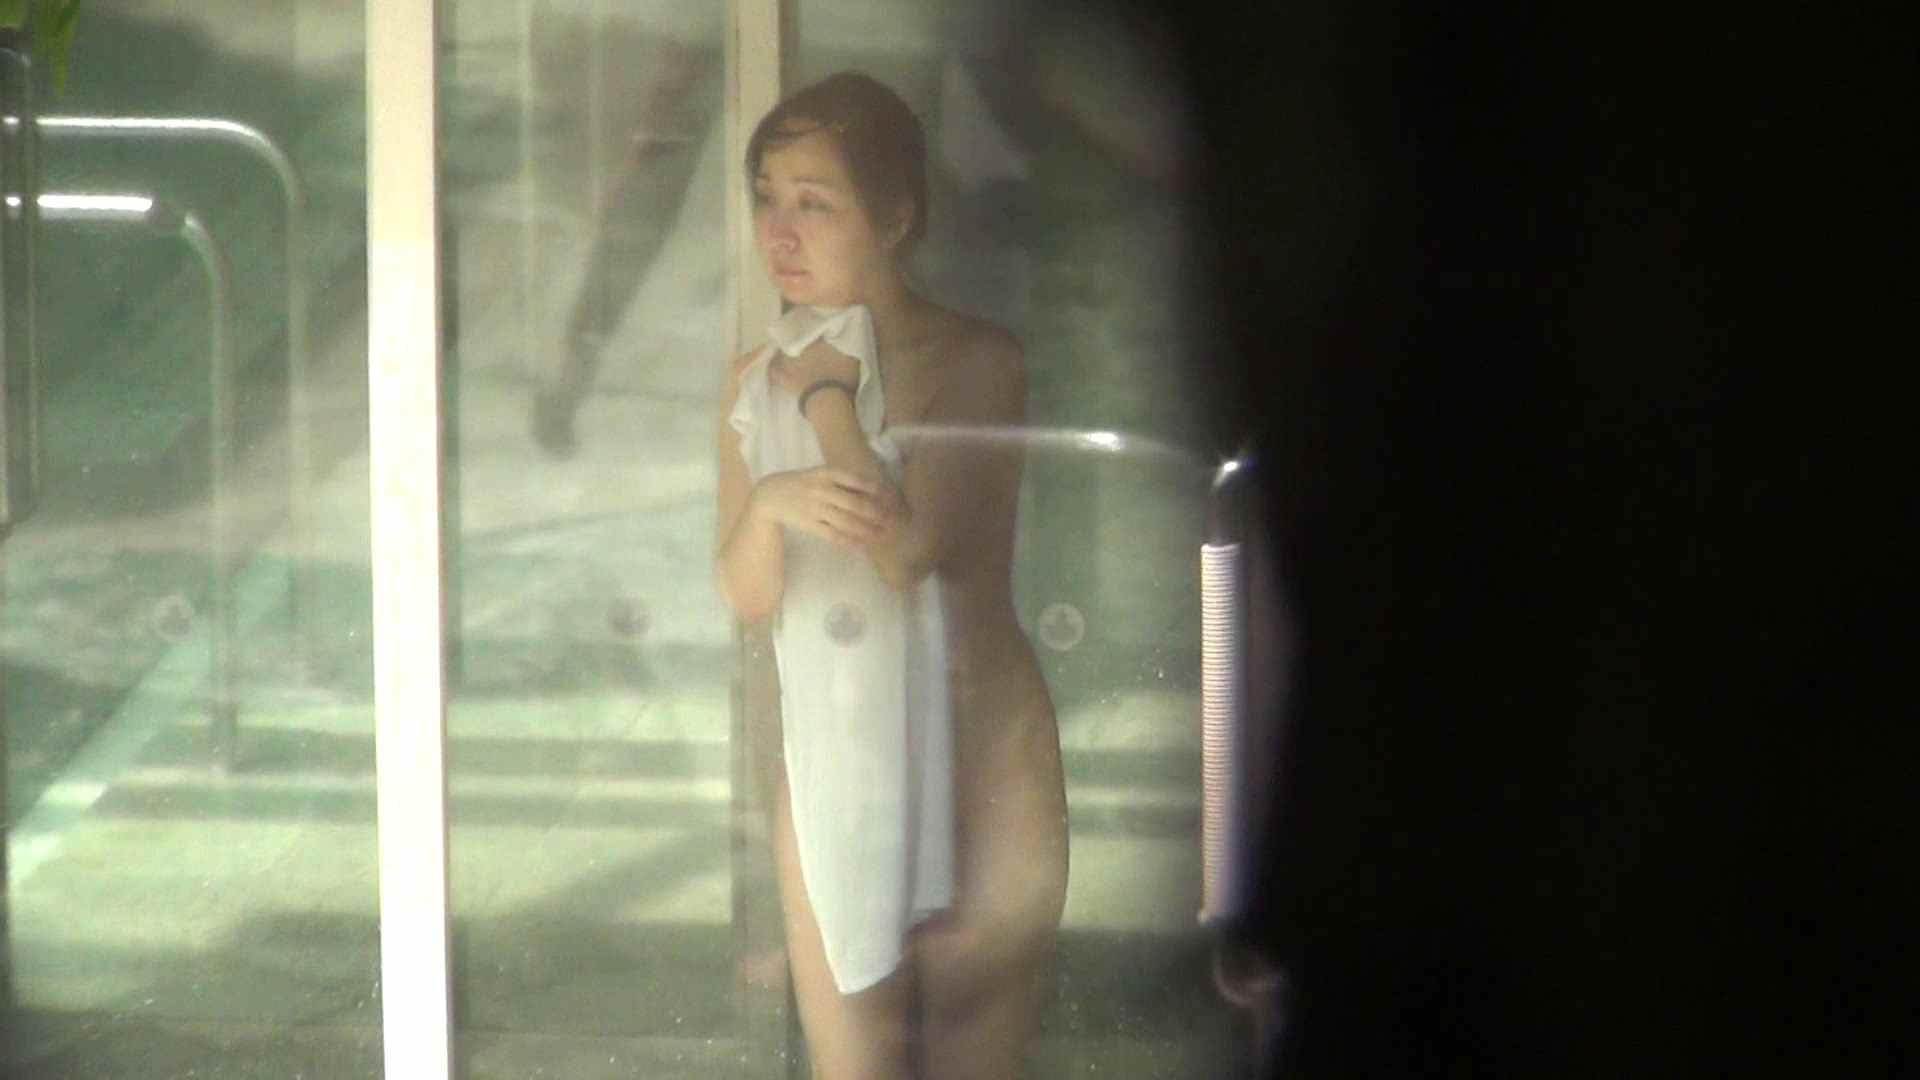 Aquaな露天風呂Vol.308 盗撮映像  75Pix 1